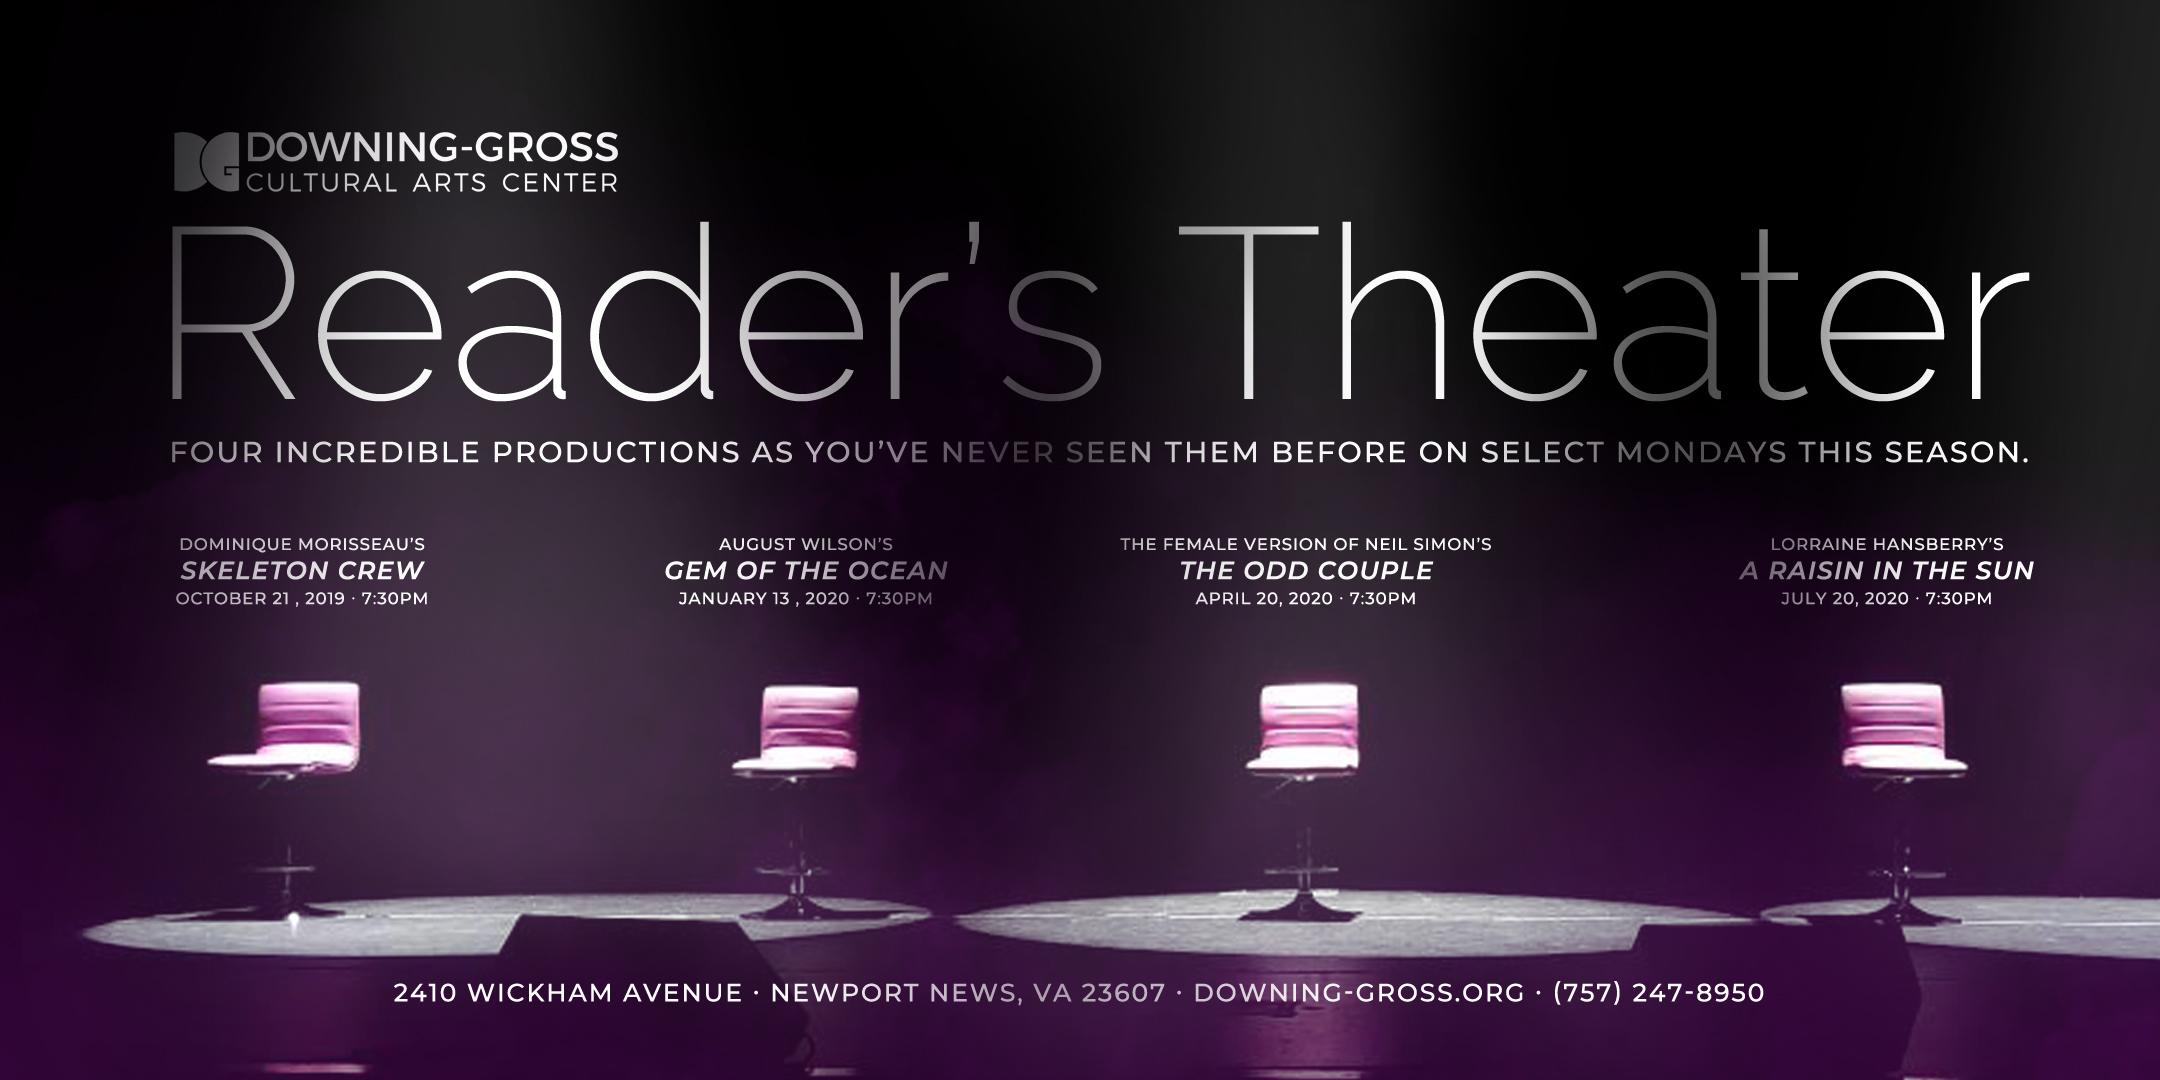 Readers Theater Eventbrite Banner.jpg